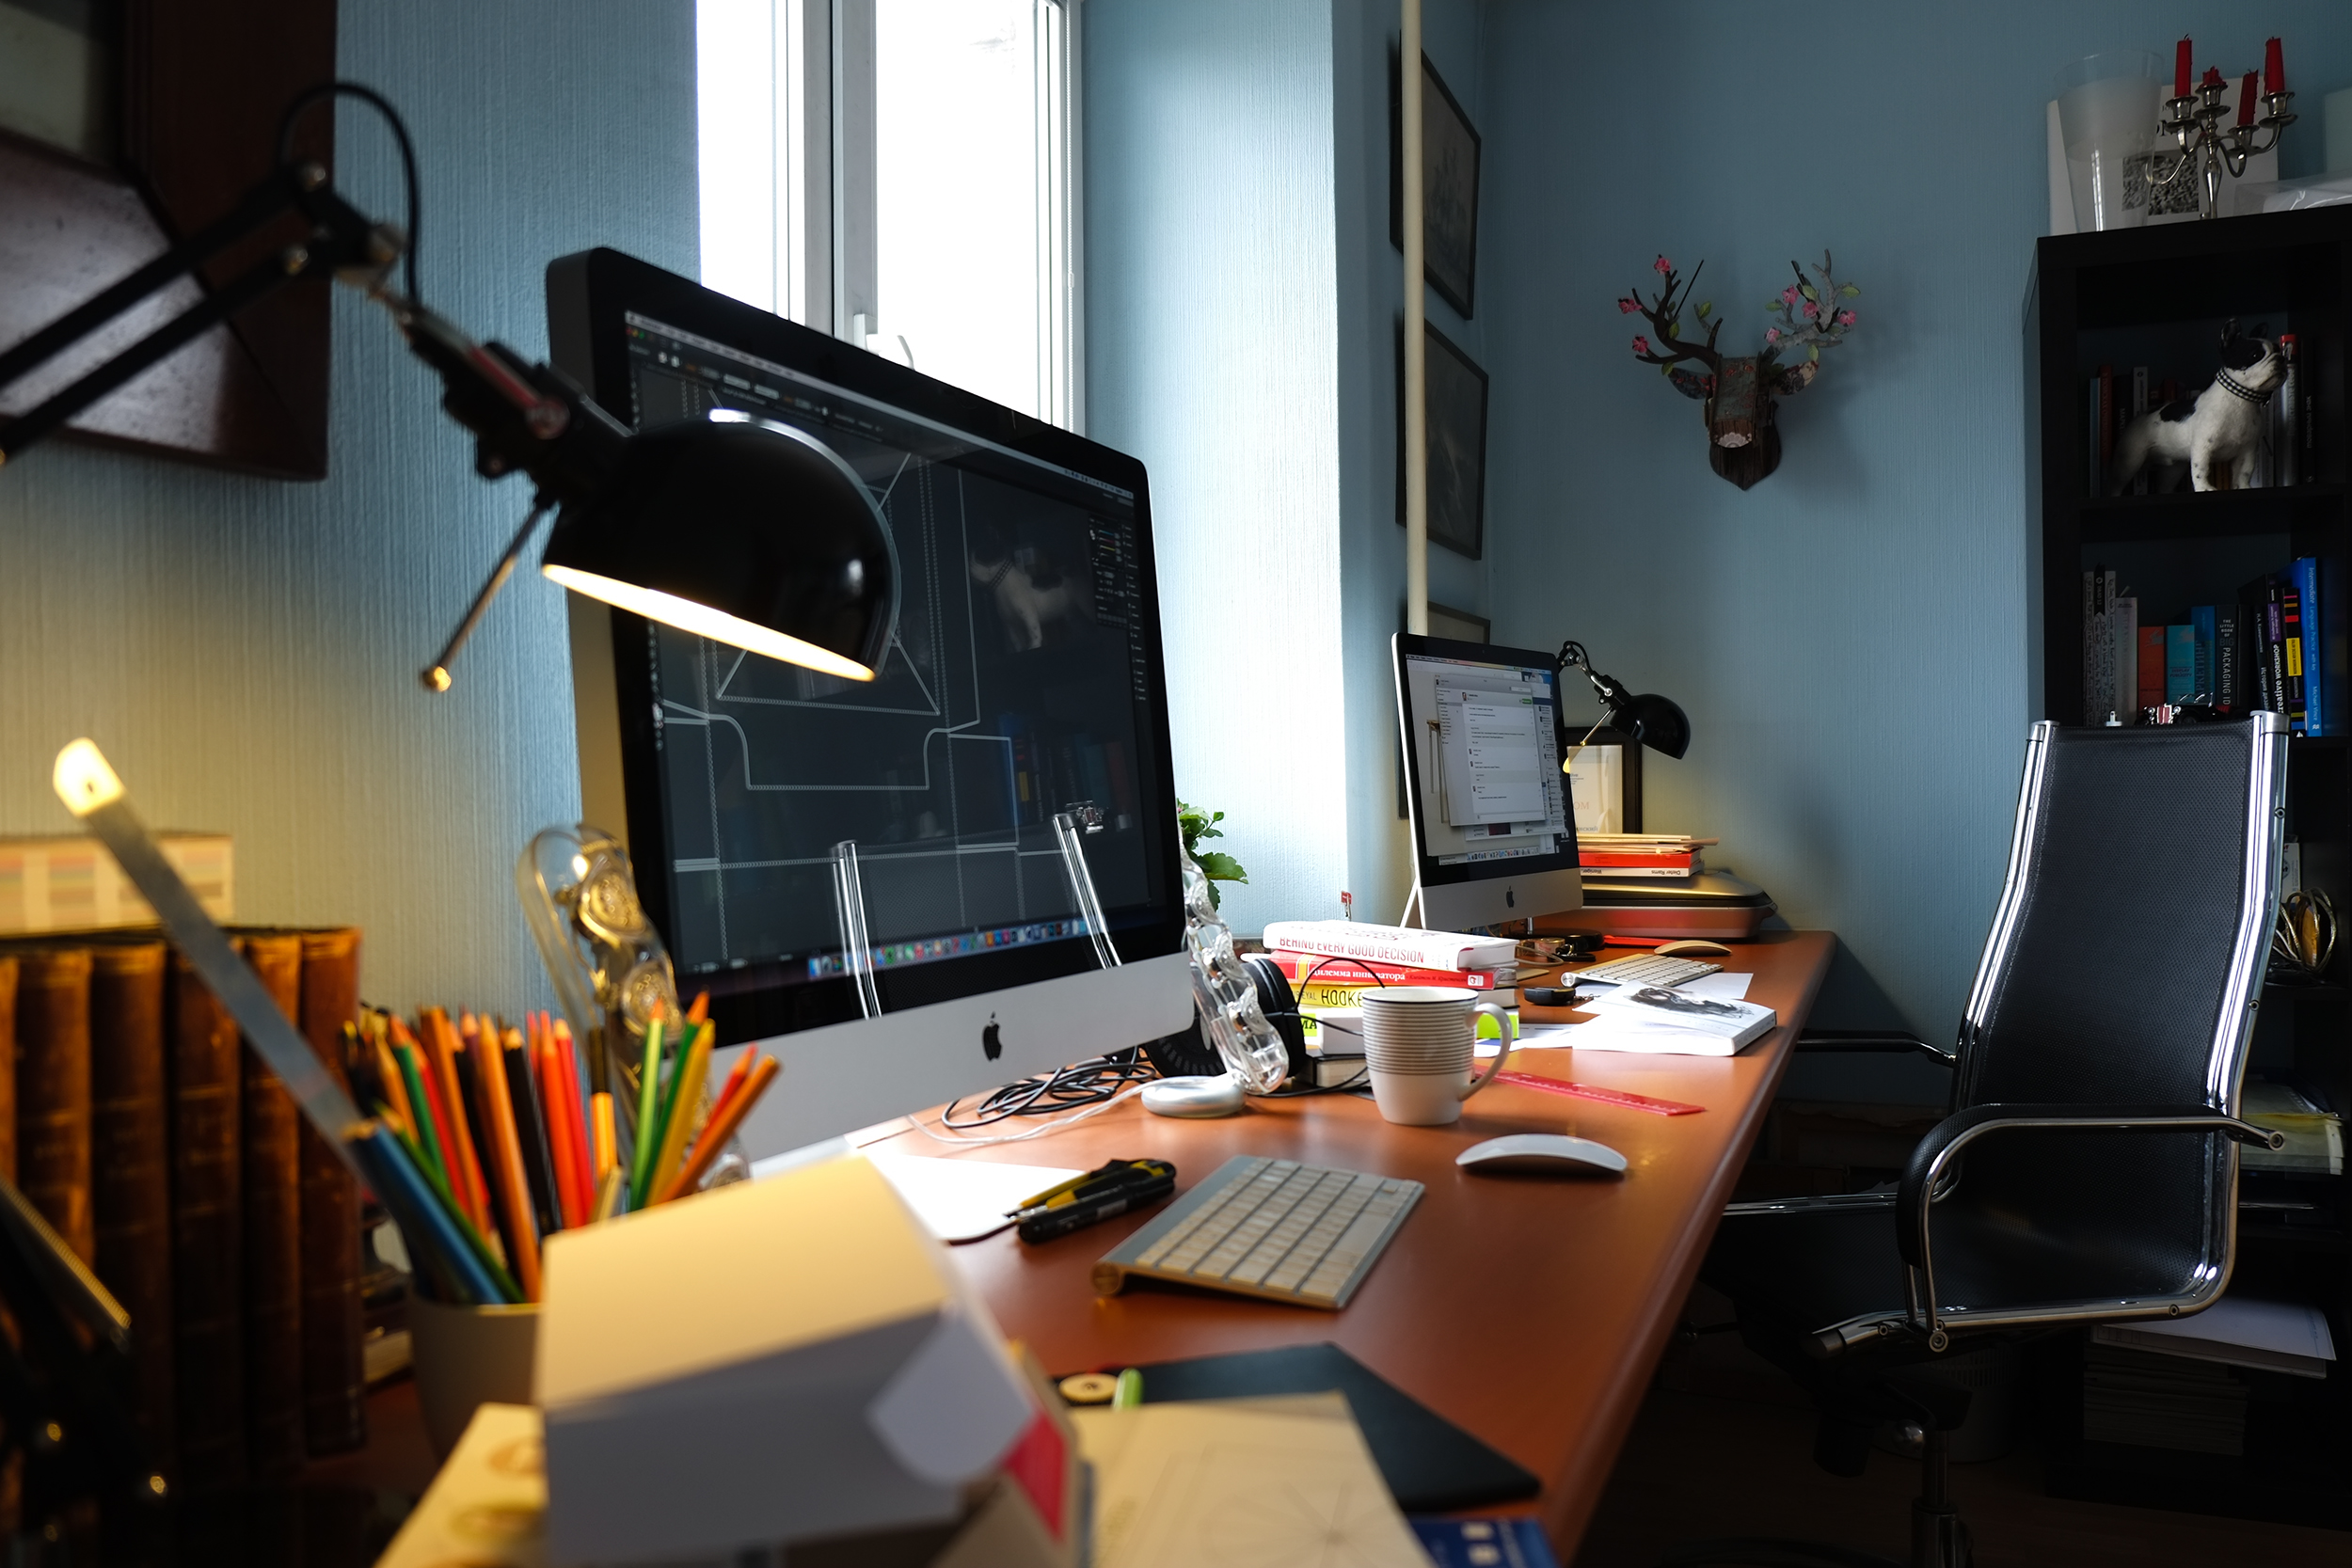 Картинка офис рабочее место